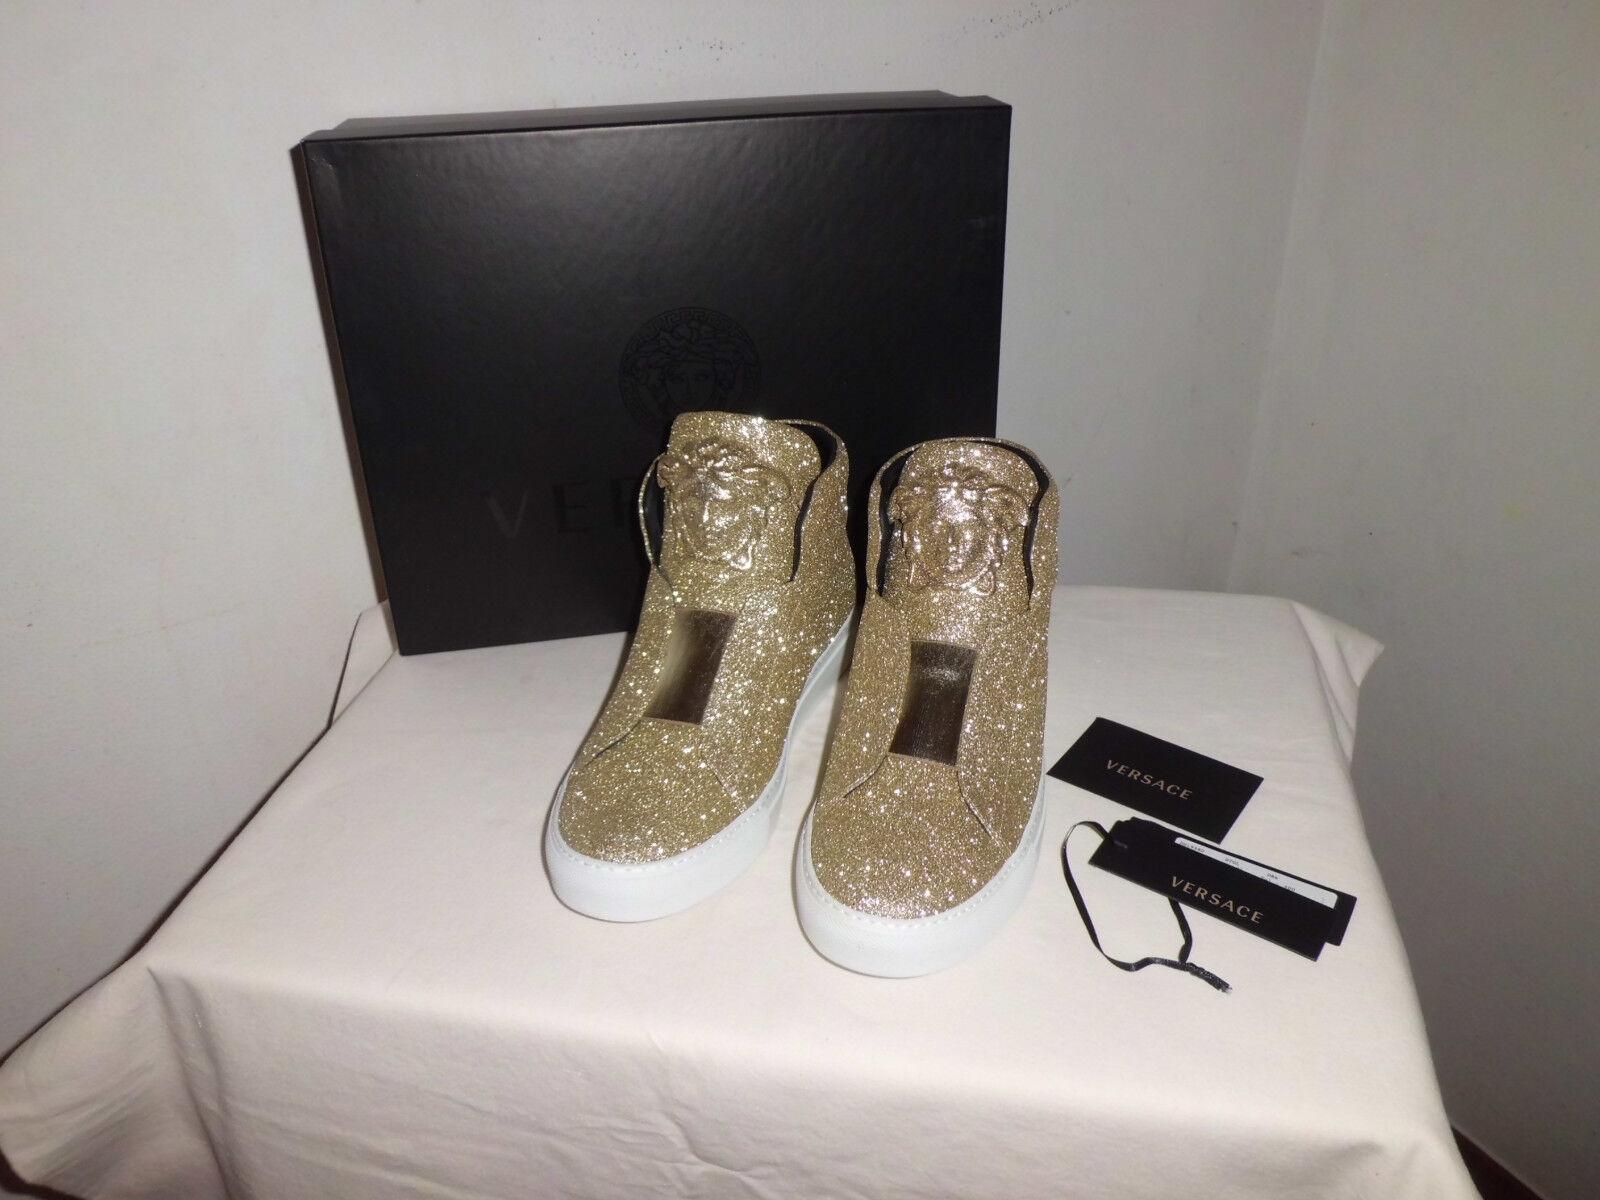 Versace Palazzo Scarpe da Ginnastica  Shoes  Glitter Glitter  Sahara size  IT 40 388b4e